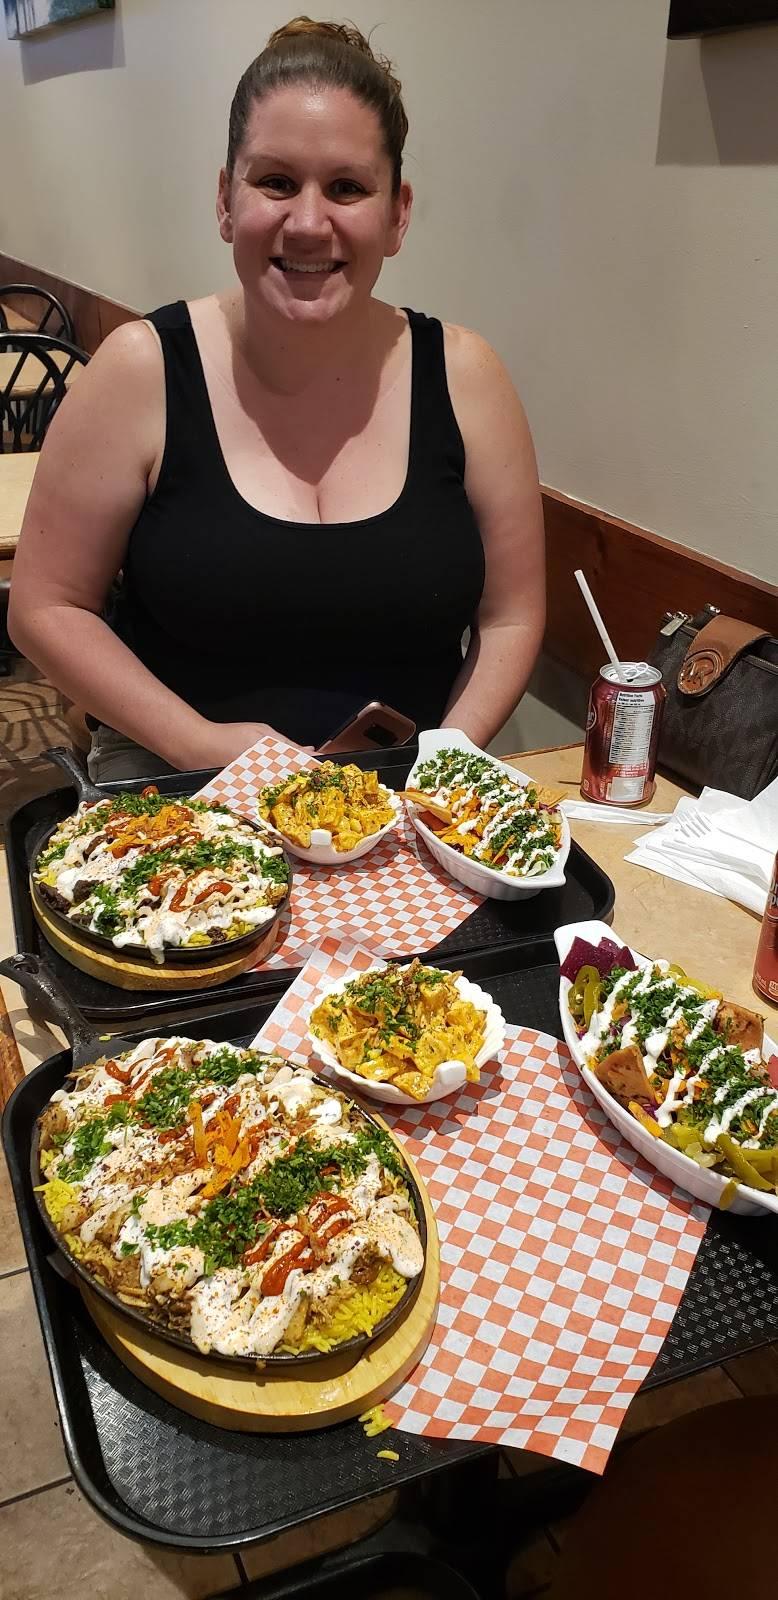 Shawarnado Shawarma | restaurant | 4870 Tomken Rd, Mississauga, ON L4W 1J8, Canada | 9056299710 OR +1 905-629-9710